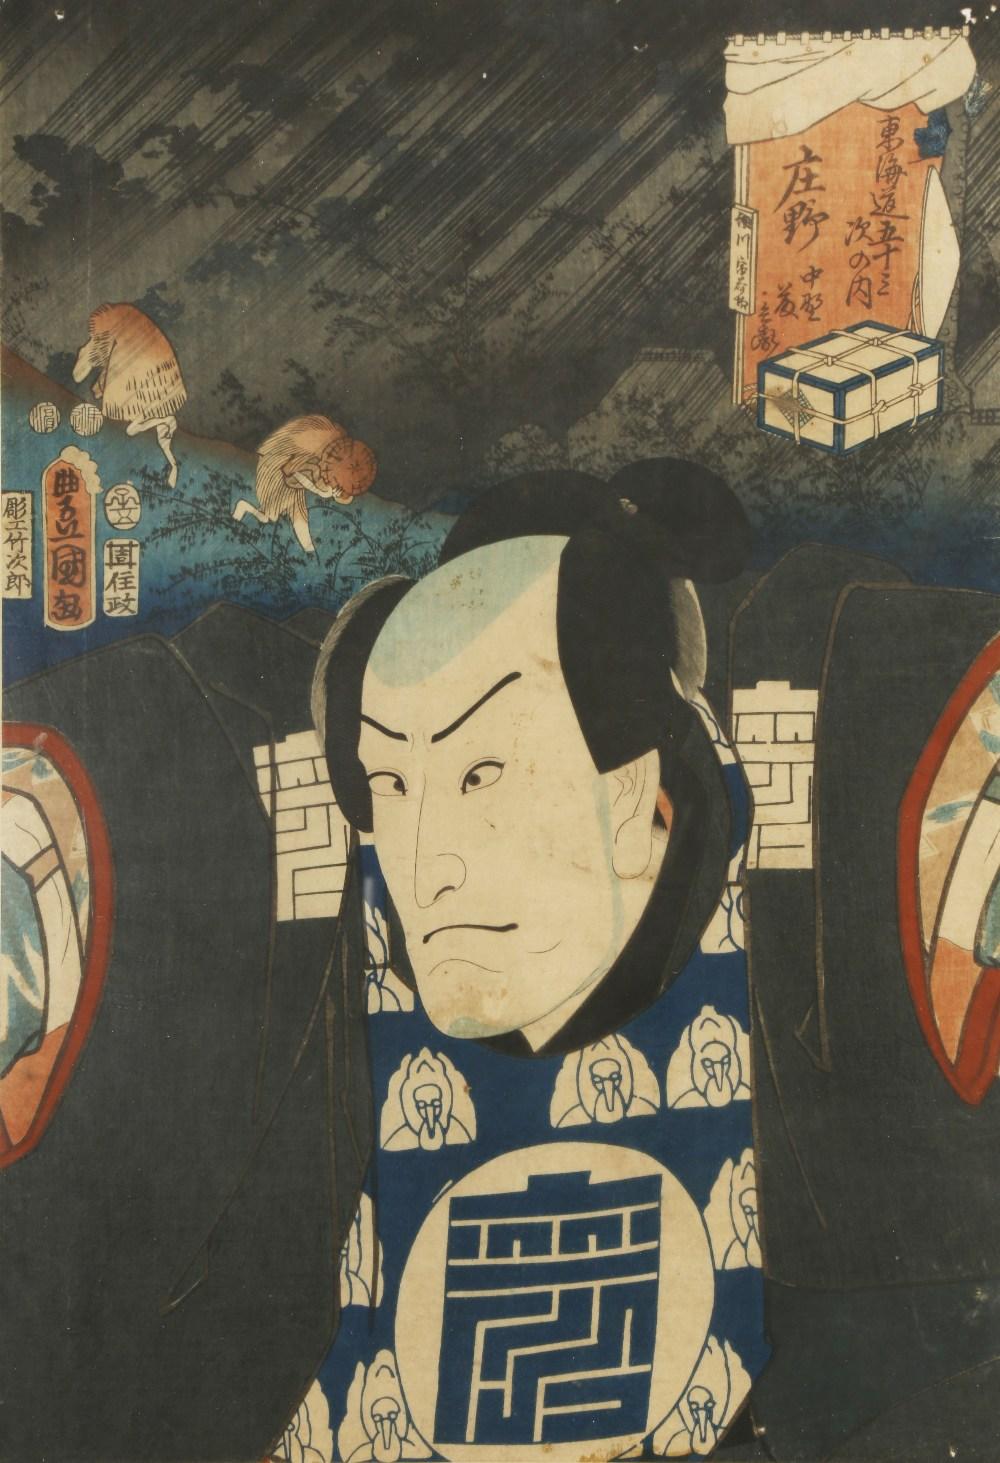 A COLLECTION OF TWELVE JAPANESE WOODBLOCK PRINTS BY UTAGAWA KUNISADA (1786-1864) MEIJI PERIOD, - Image 12 of 12